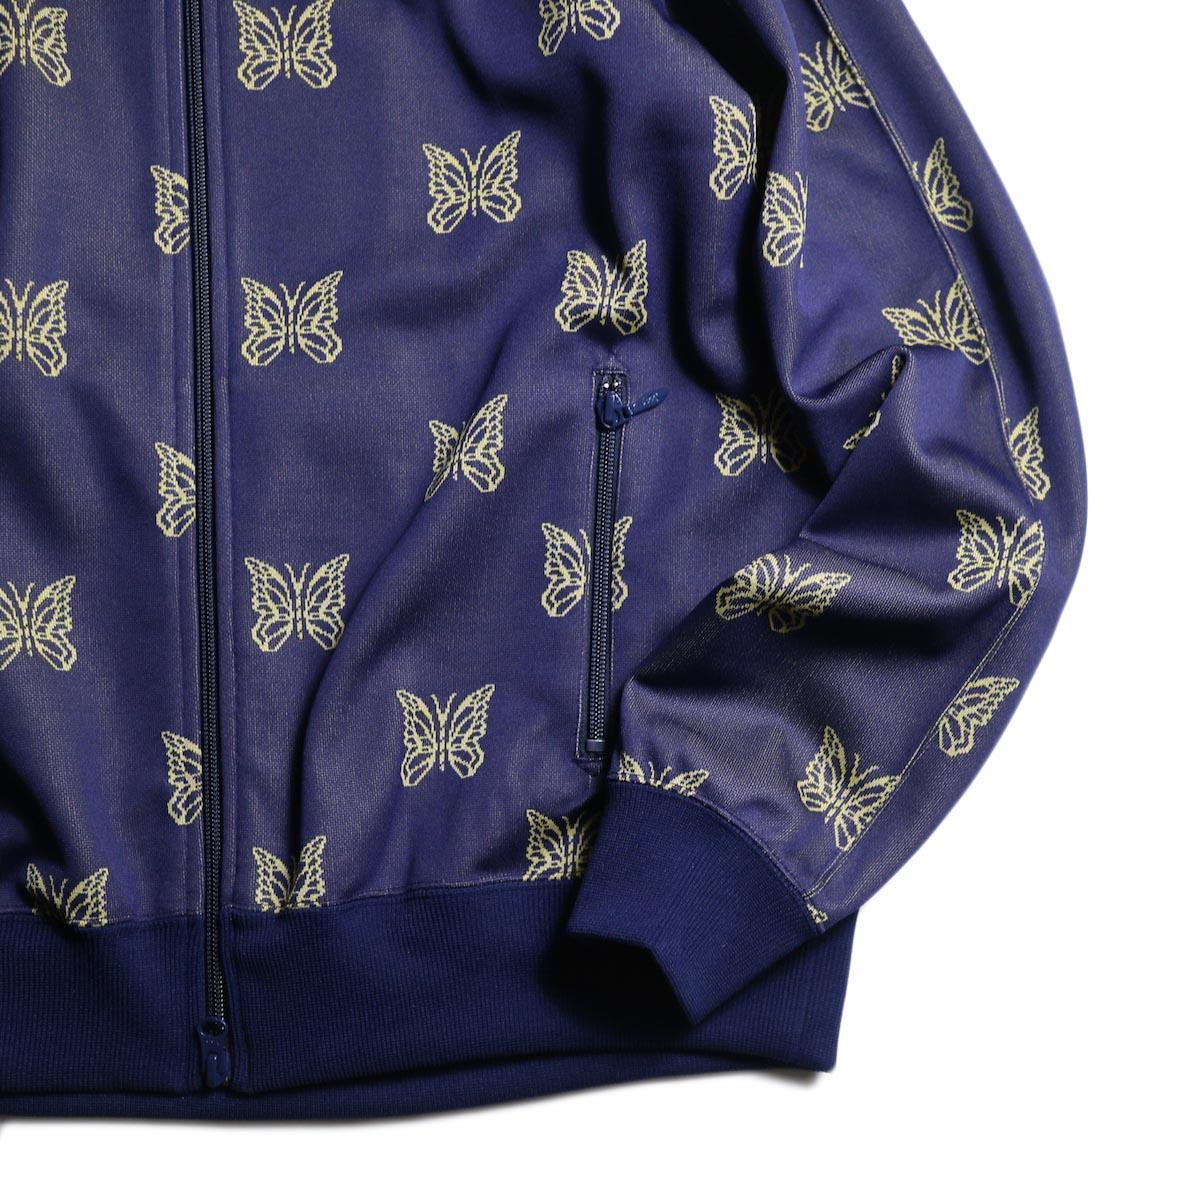 Needles / Track Jacket - Poly Jacquard (Papillon)袖、裾